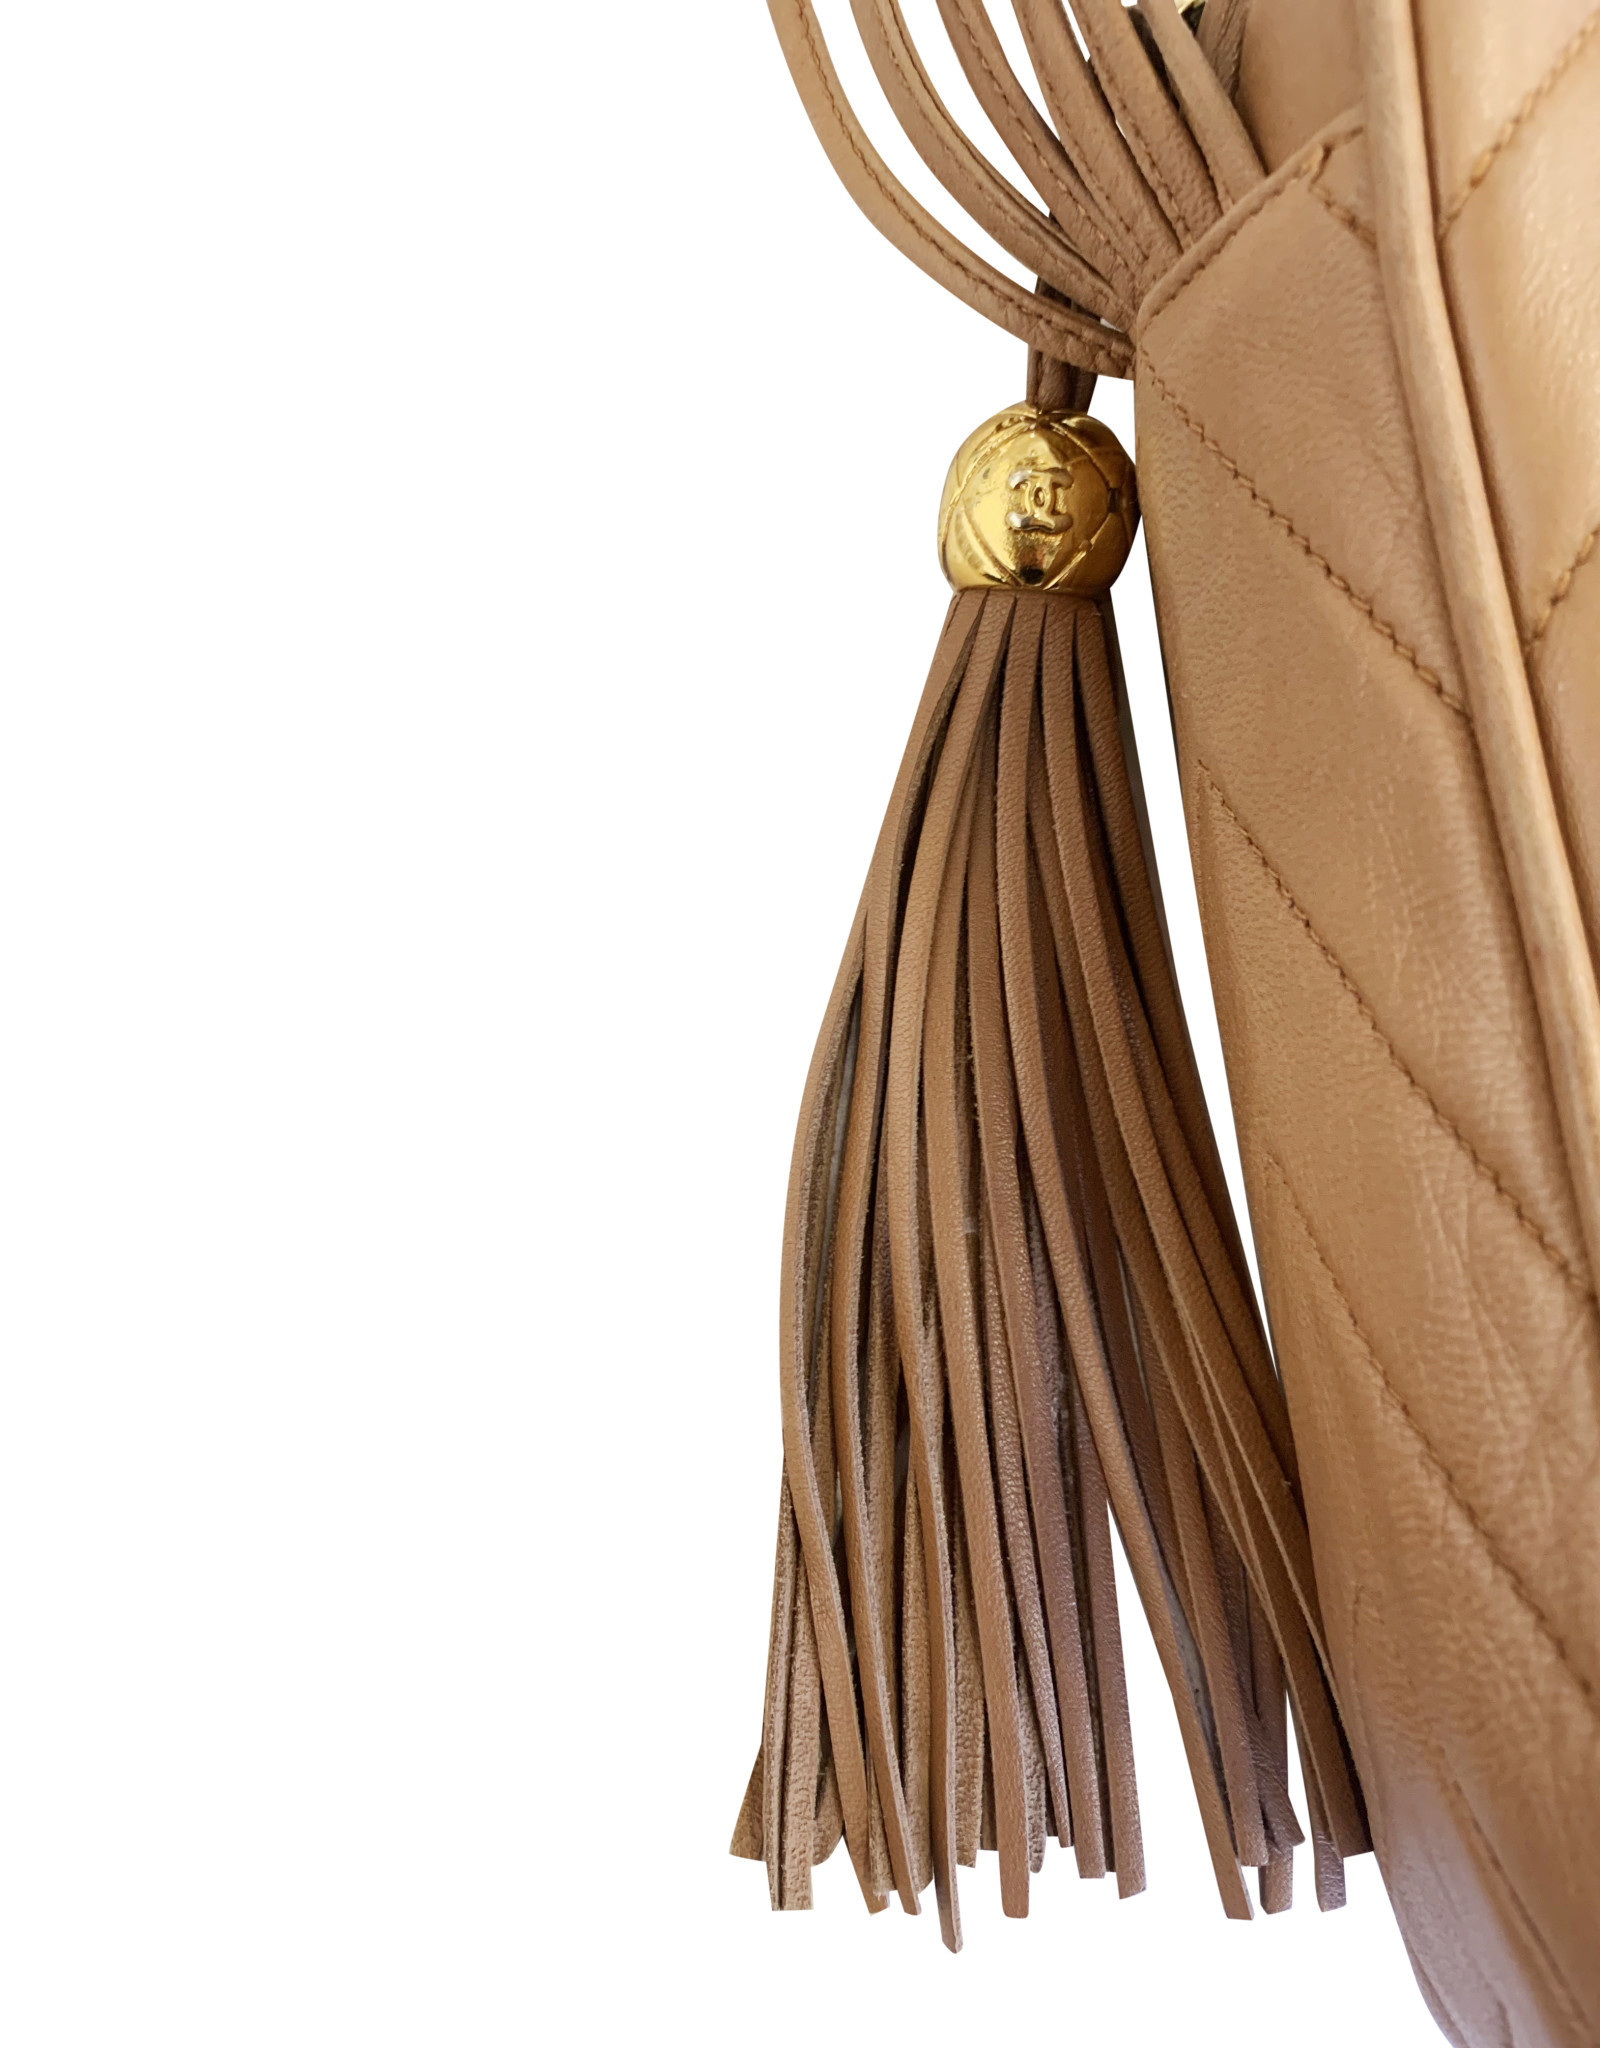 Wyld Blue Vintage Chanel Quilted Milk Chocolate Tassel Bag